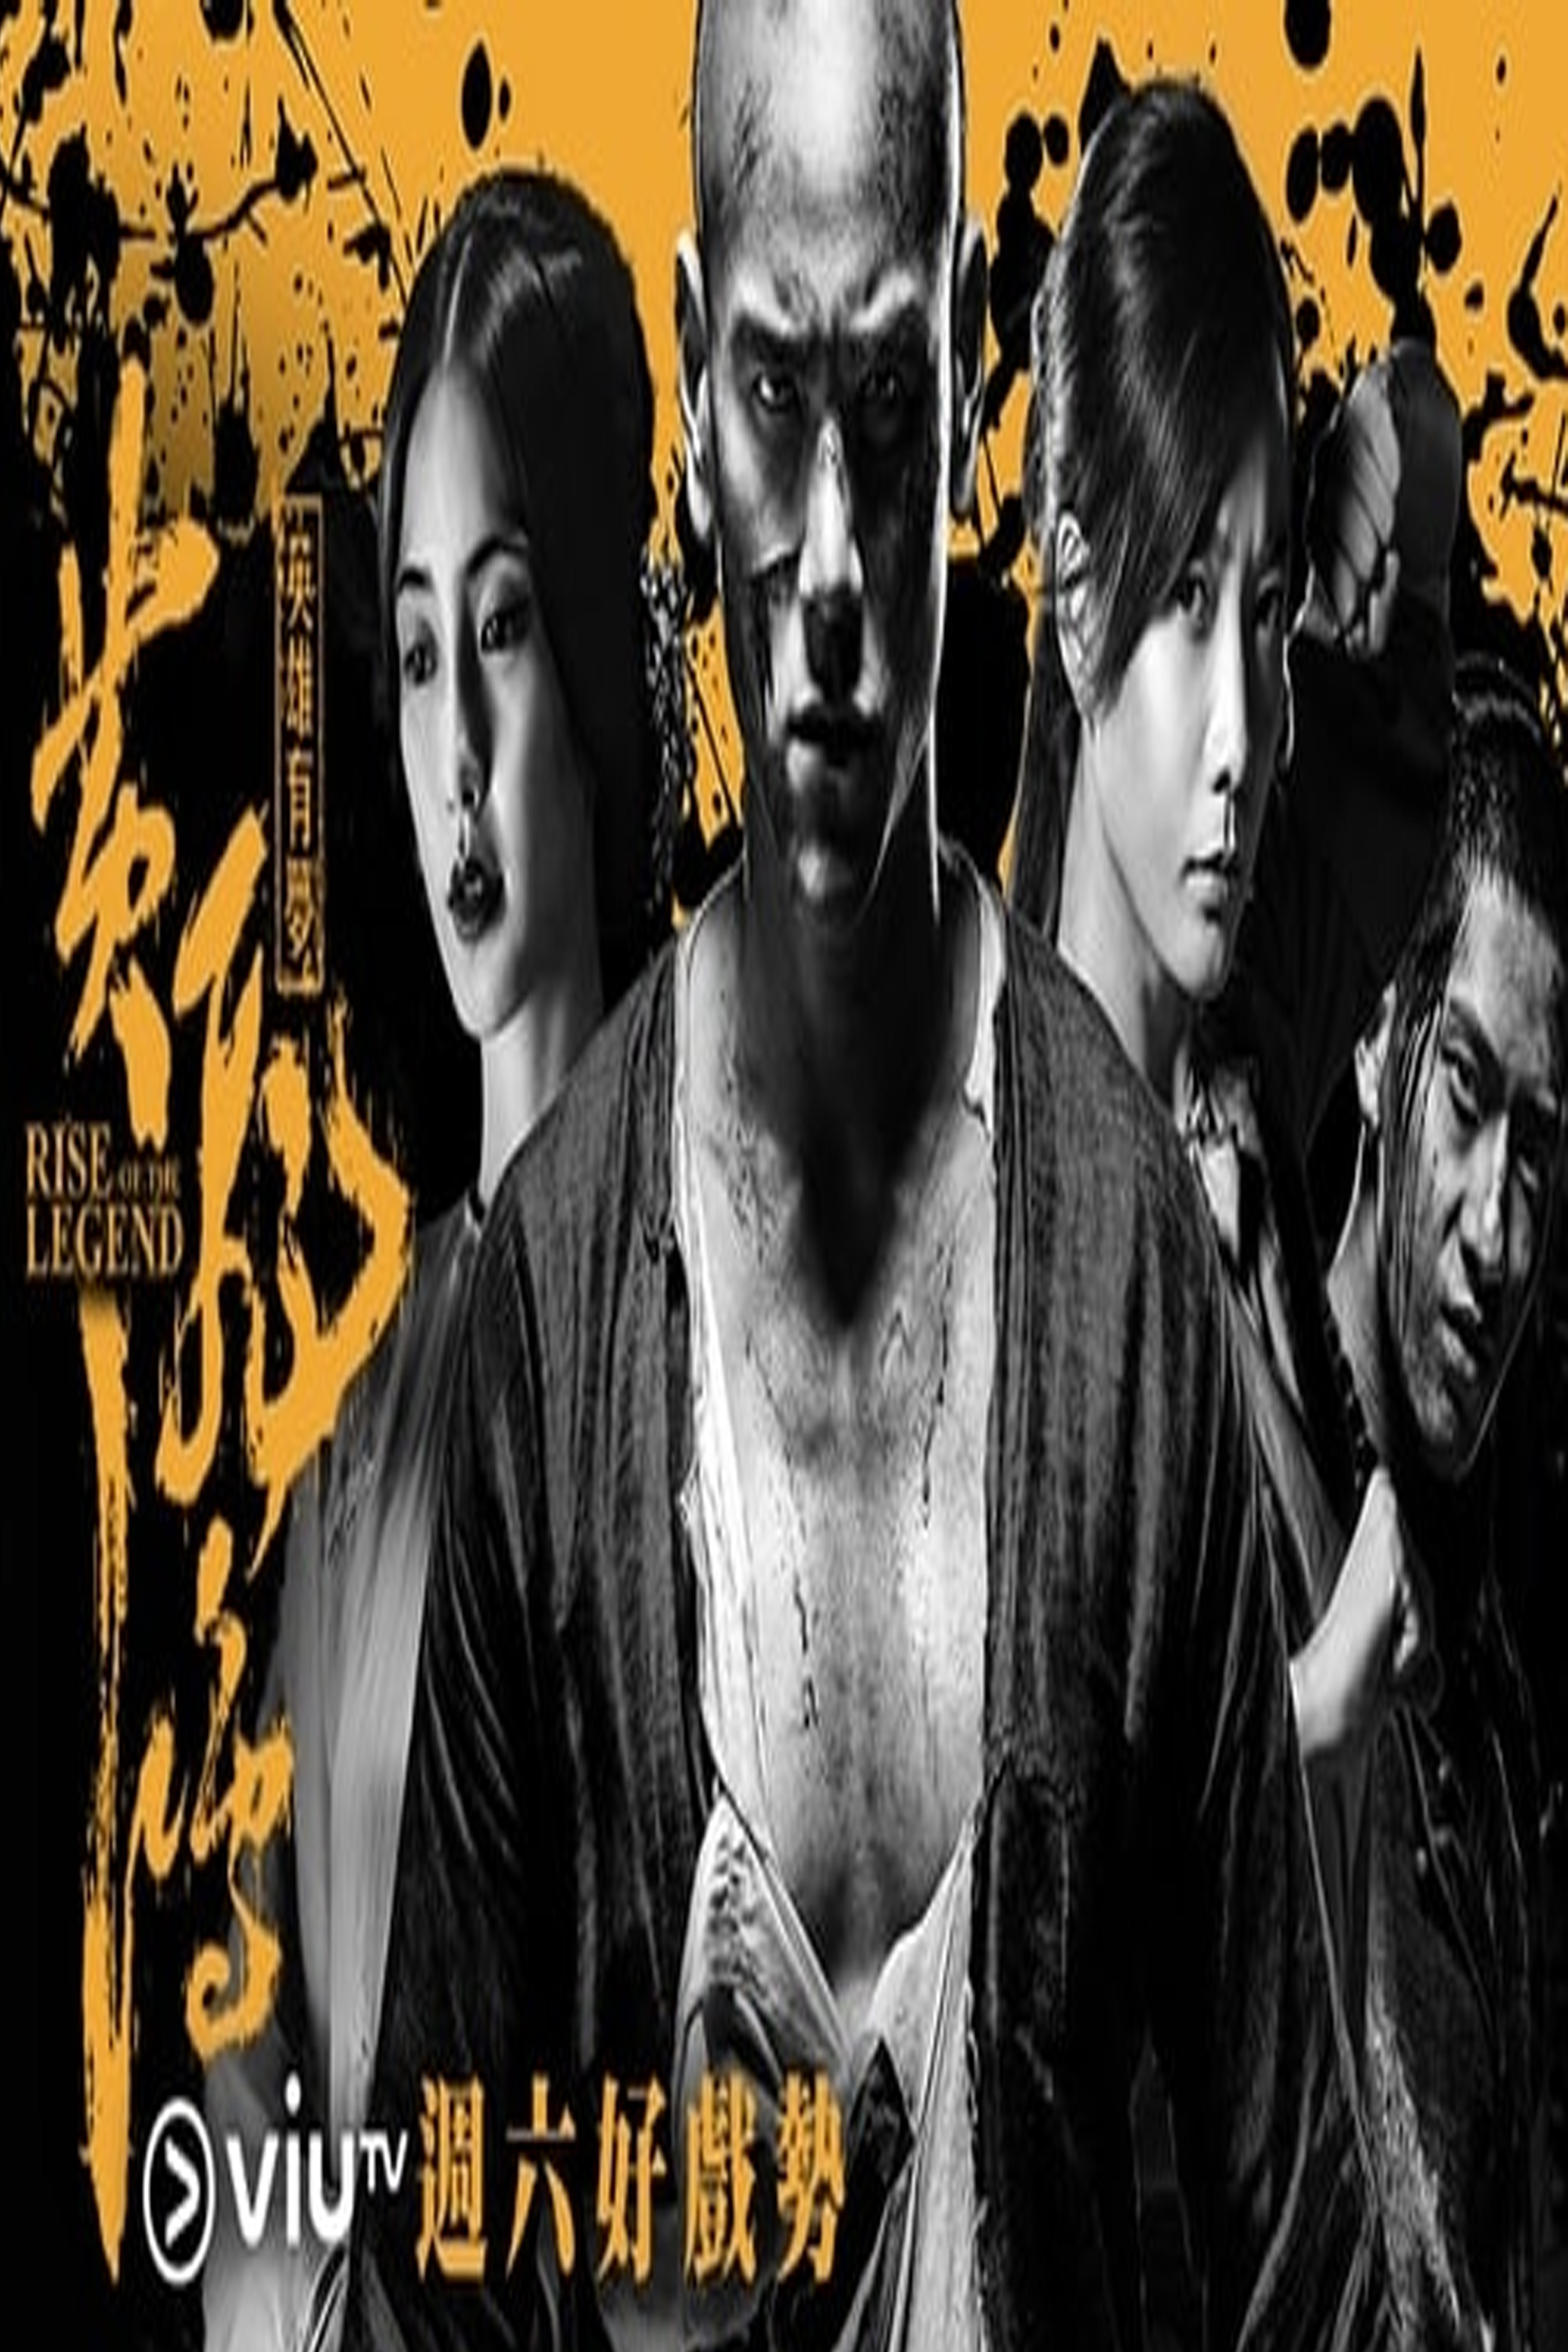 Rise of the Legend - 黃飛鴻之英雄有夢